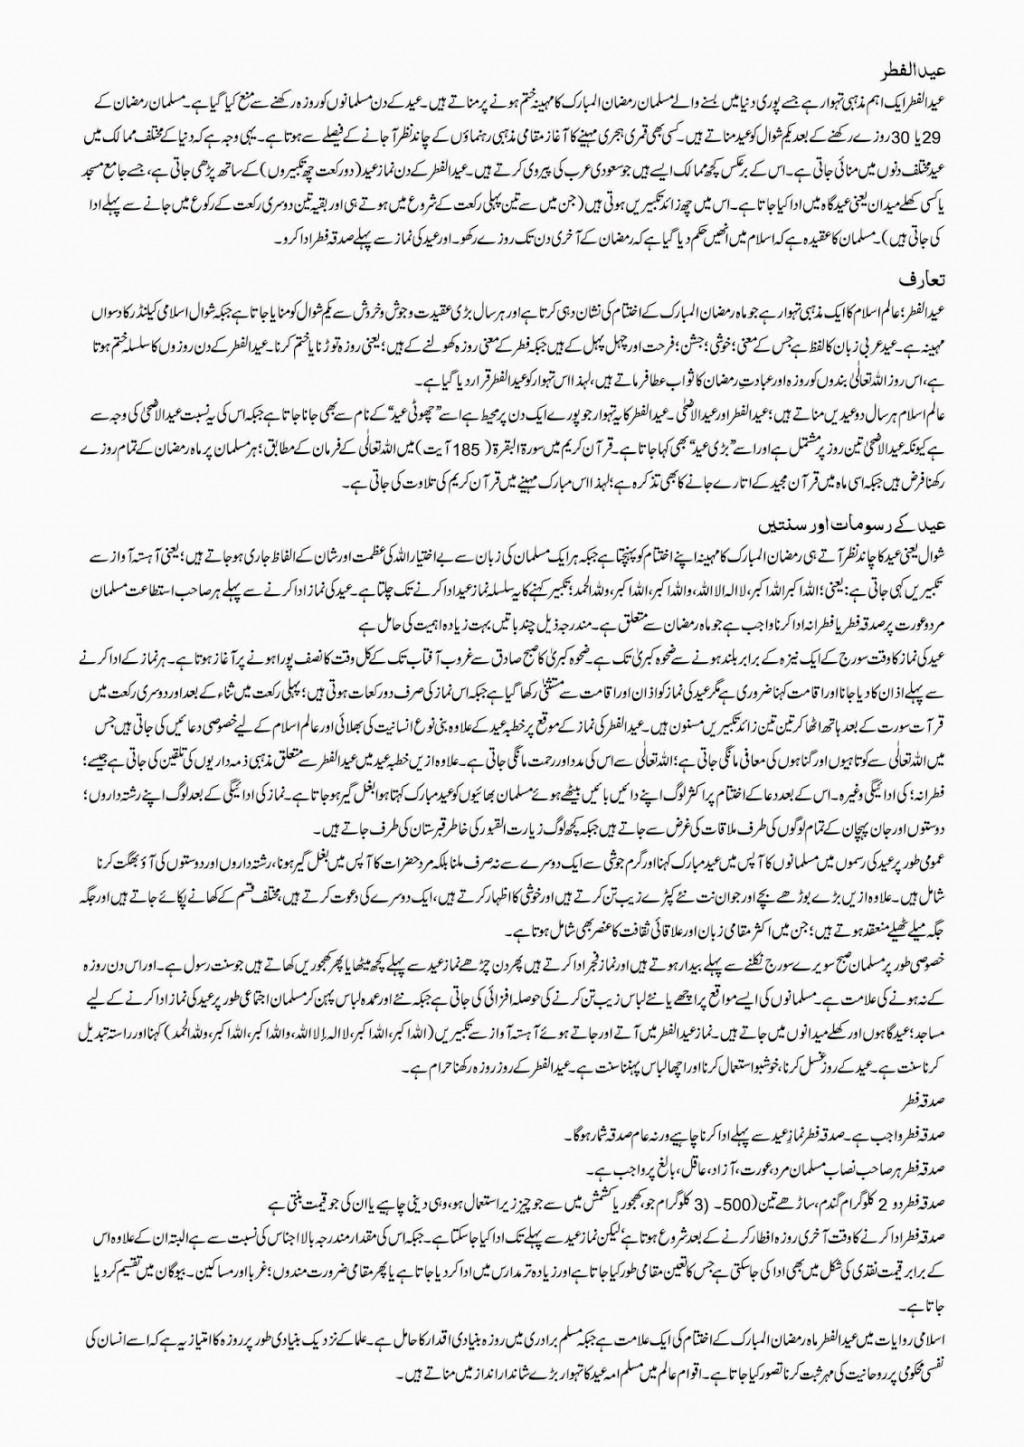 002 Essay Example Eid2bal2bfitar Mahatma Gandhi In Imposing Urdu Language Jayanti Speech Large